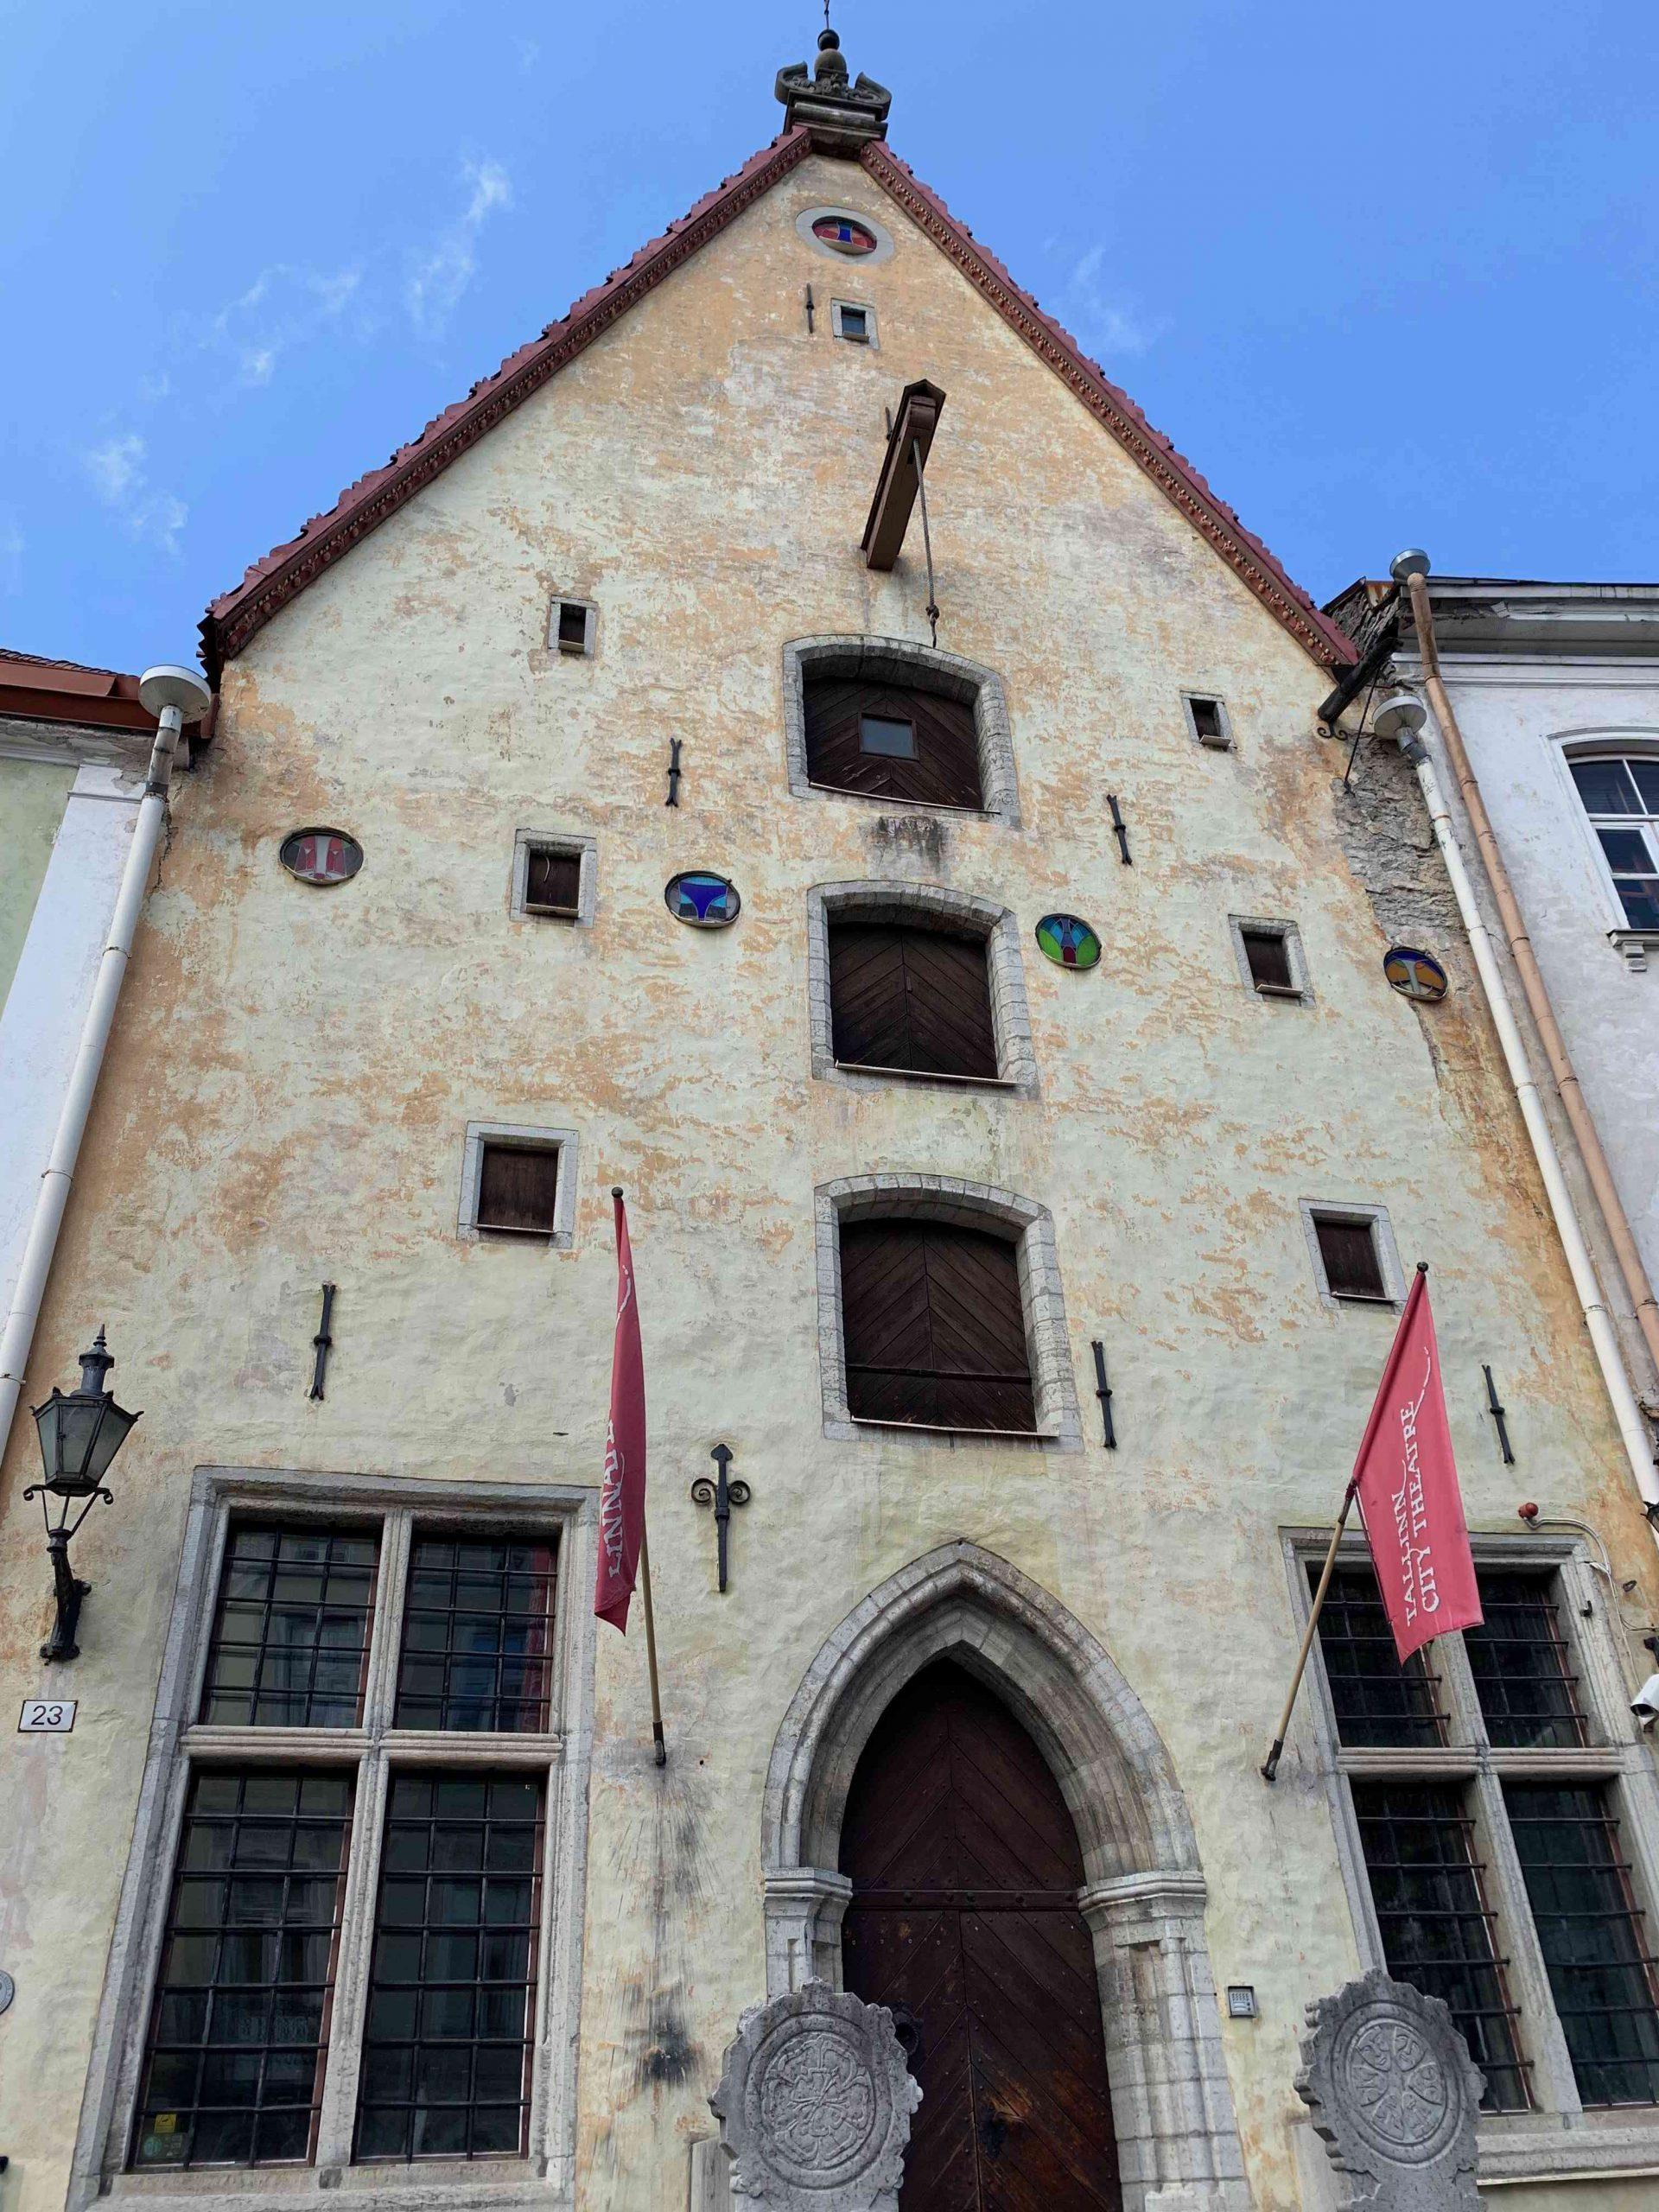 Tallín la joya medieval del Báltico